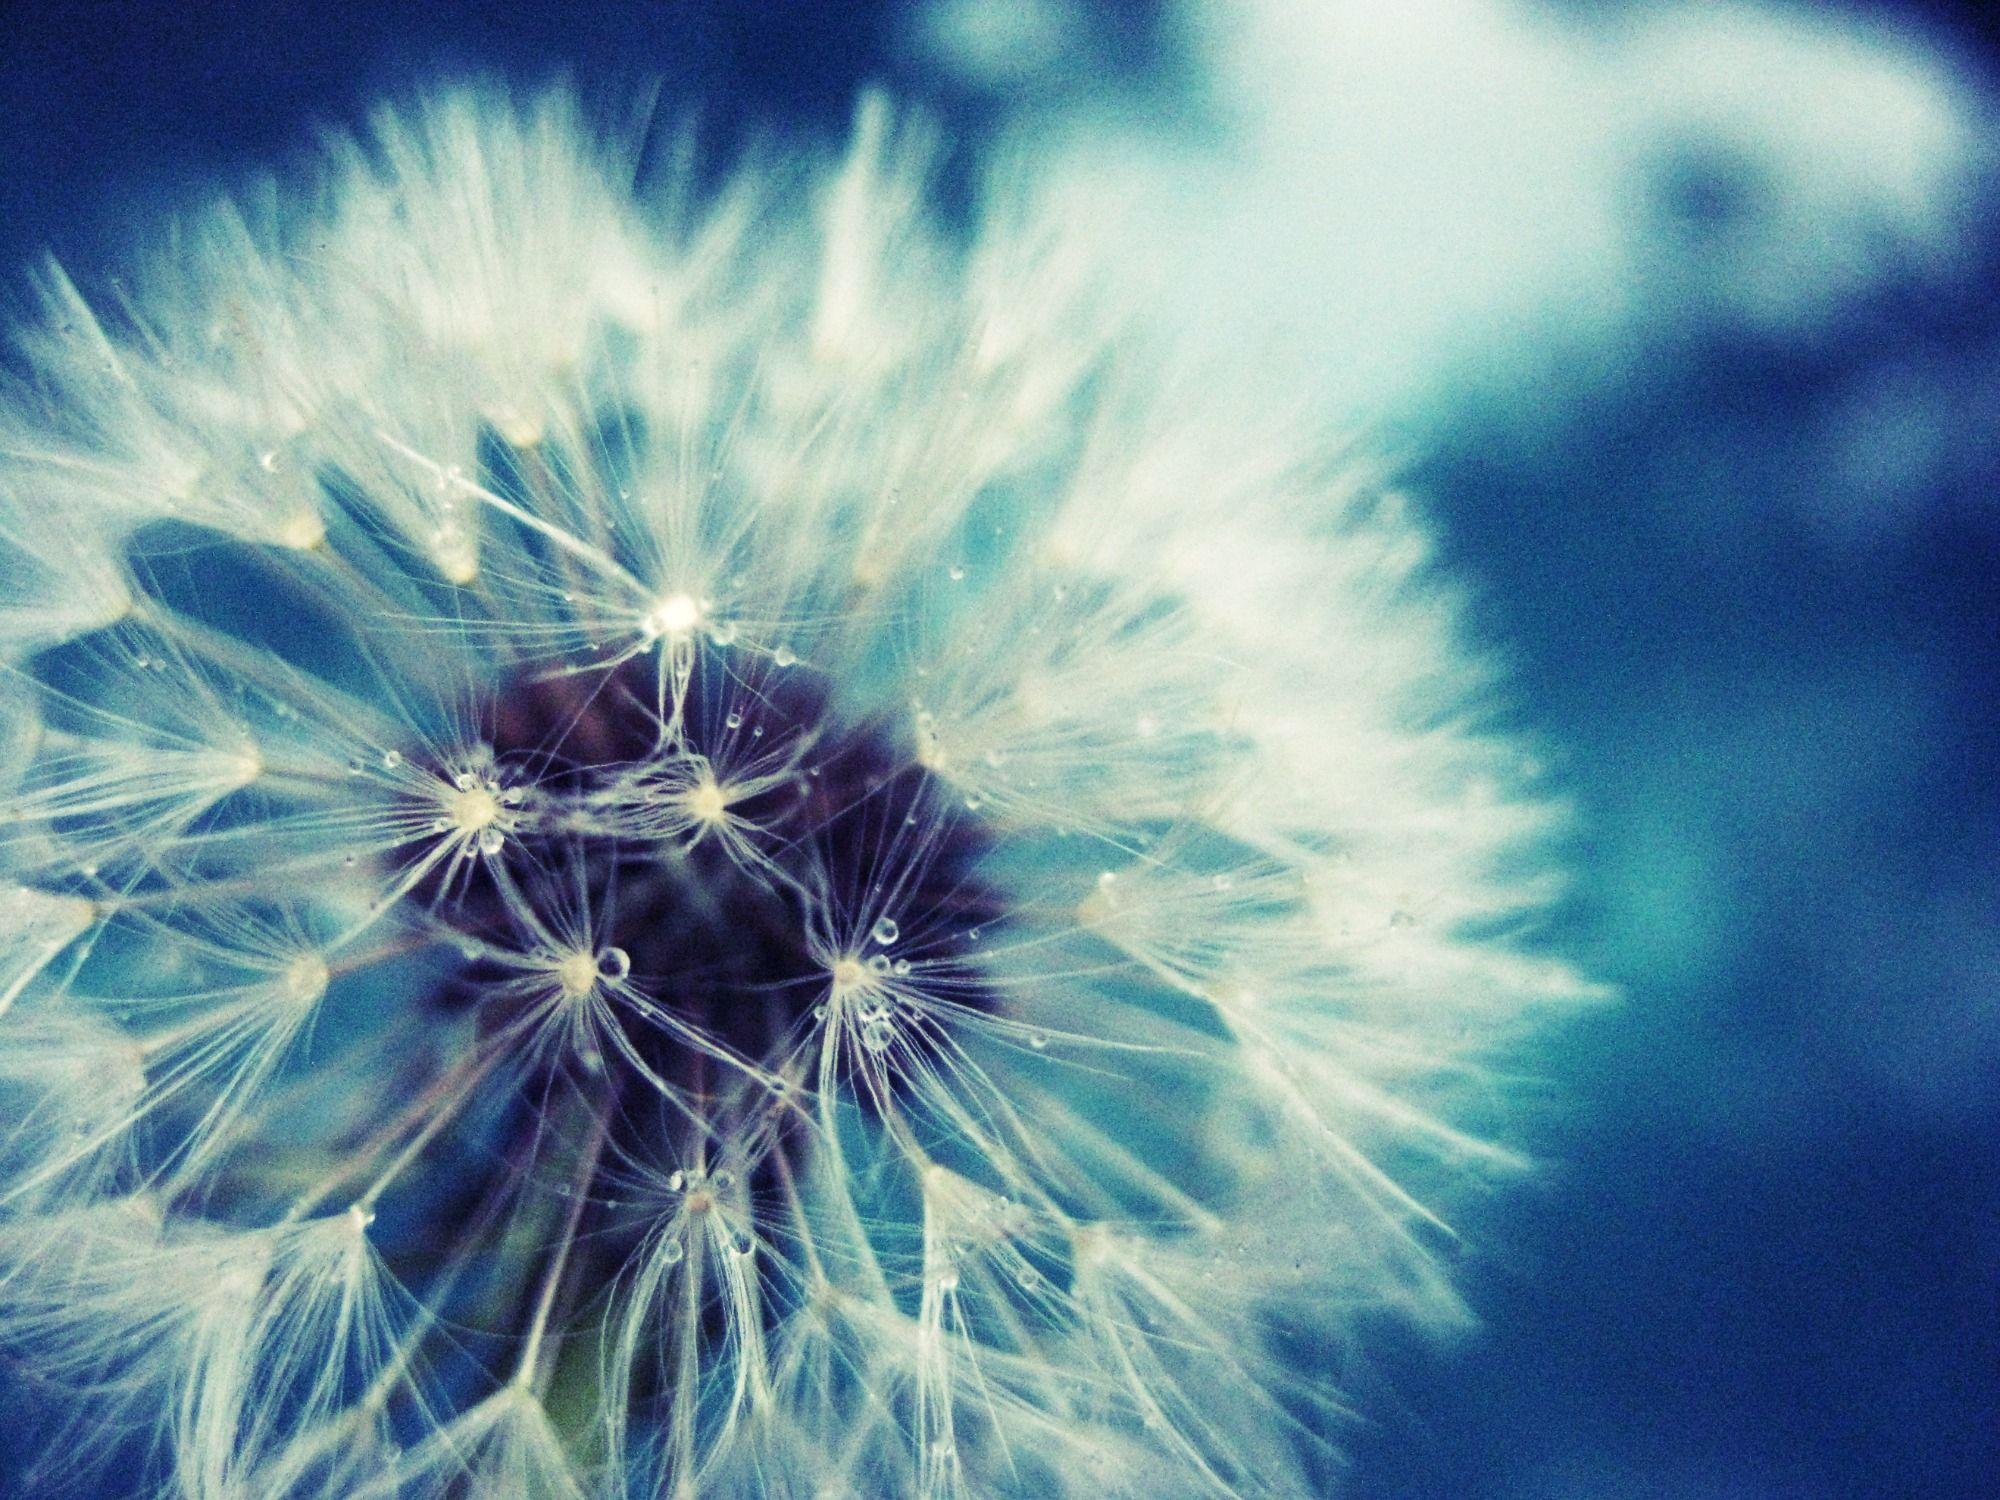 dandelion images | hd wallpapers | pinterest | dandelions and